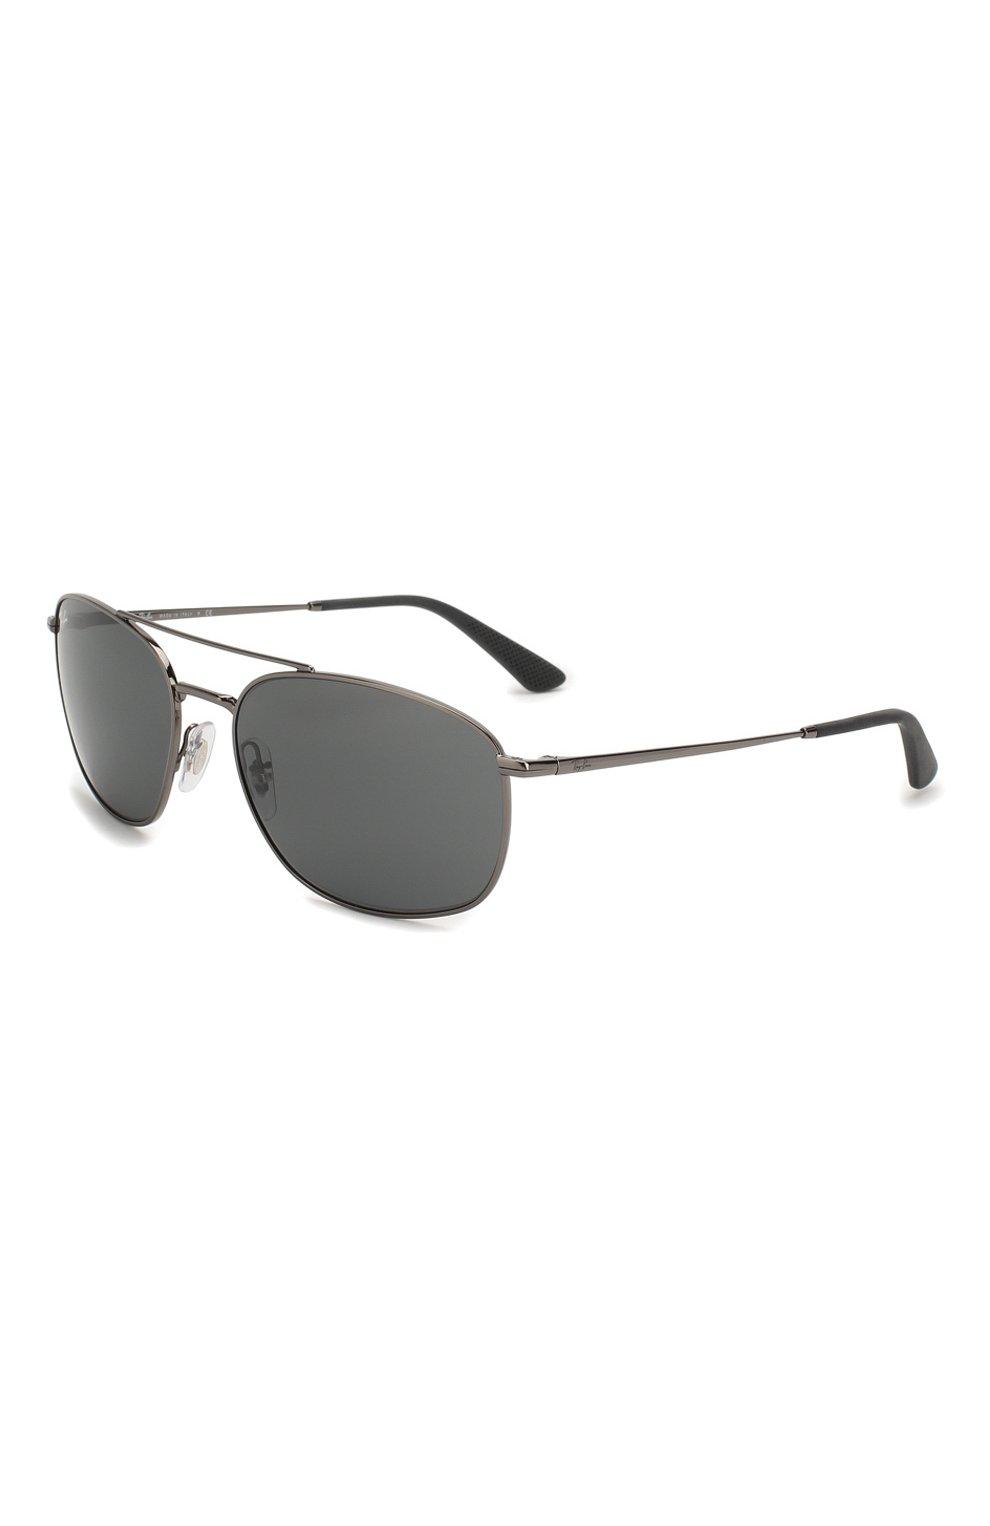 Мужские солнцезащитные очки RAY-BAN темно-серого цвета, арт. 3654-004/87   Фото 1